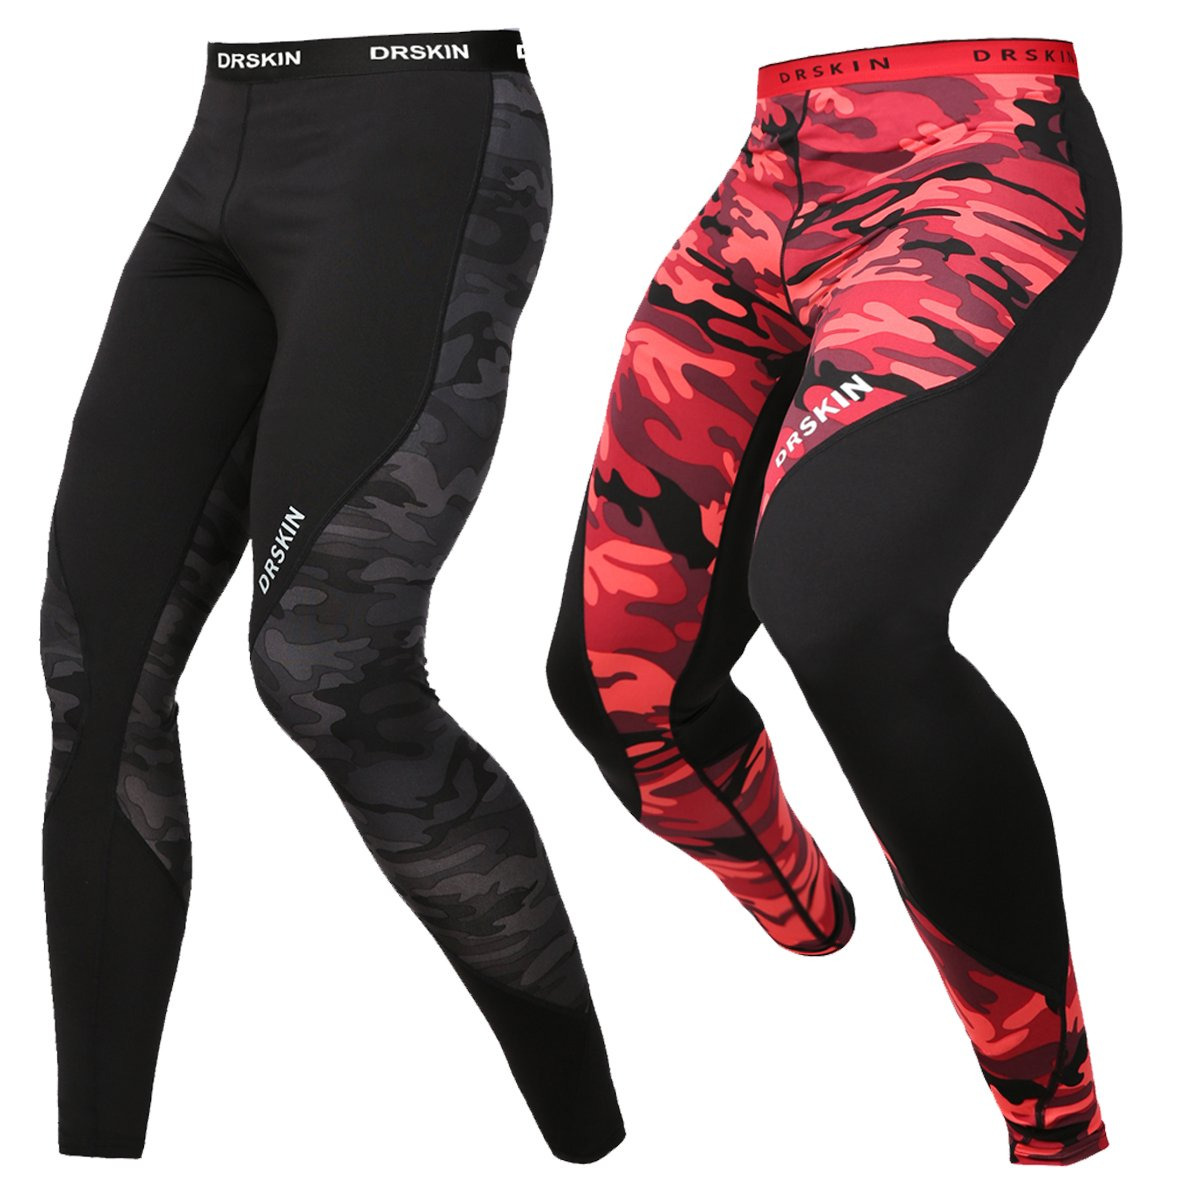 DRSKIN Men's Compression Dry Cool Sports Tights Pants Baselayer Running Leggings Yoga (Twin (MRE-B03+B-MBB04), XL) by DRSKIN